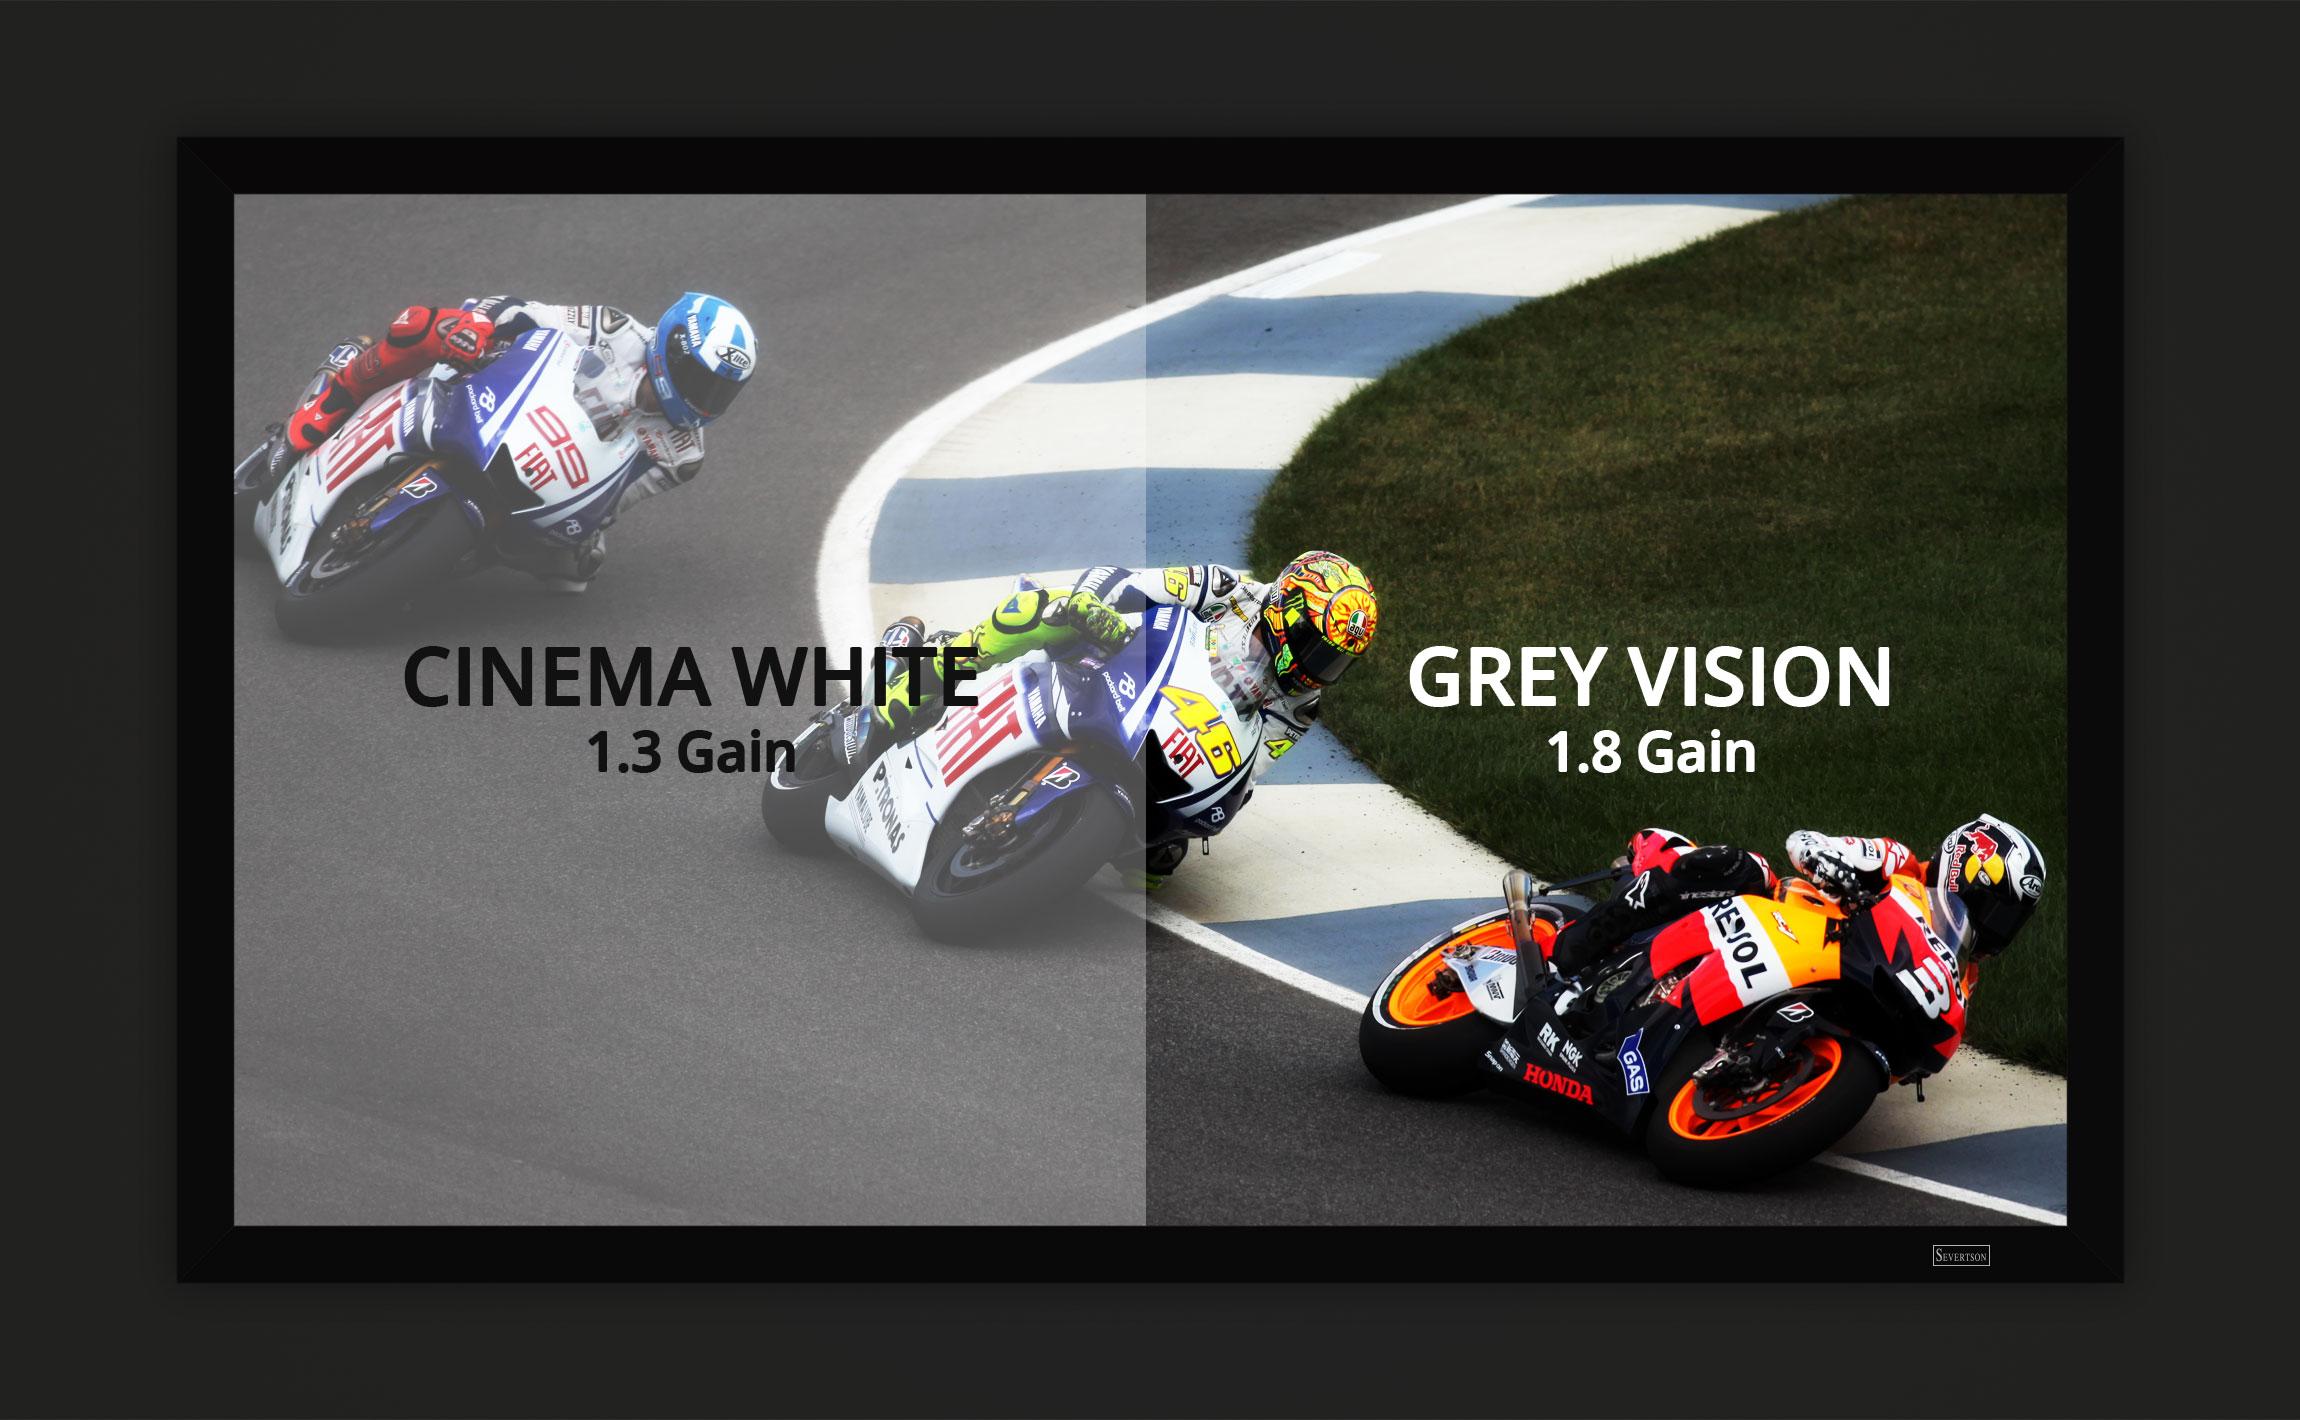 Grey Vision High Contrast High Brightness Alr Screen